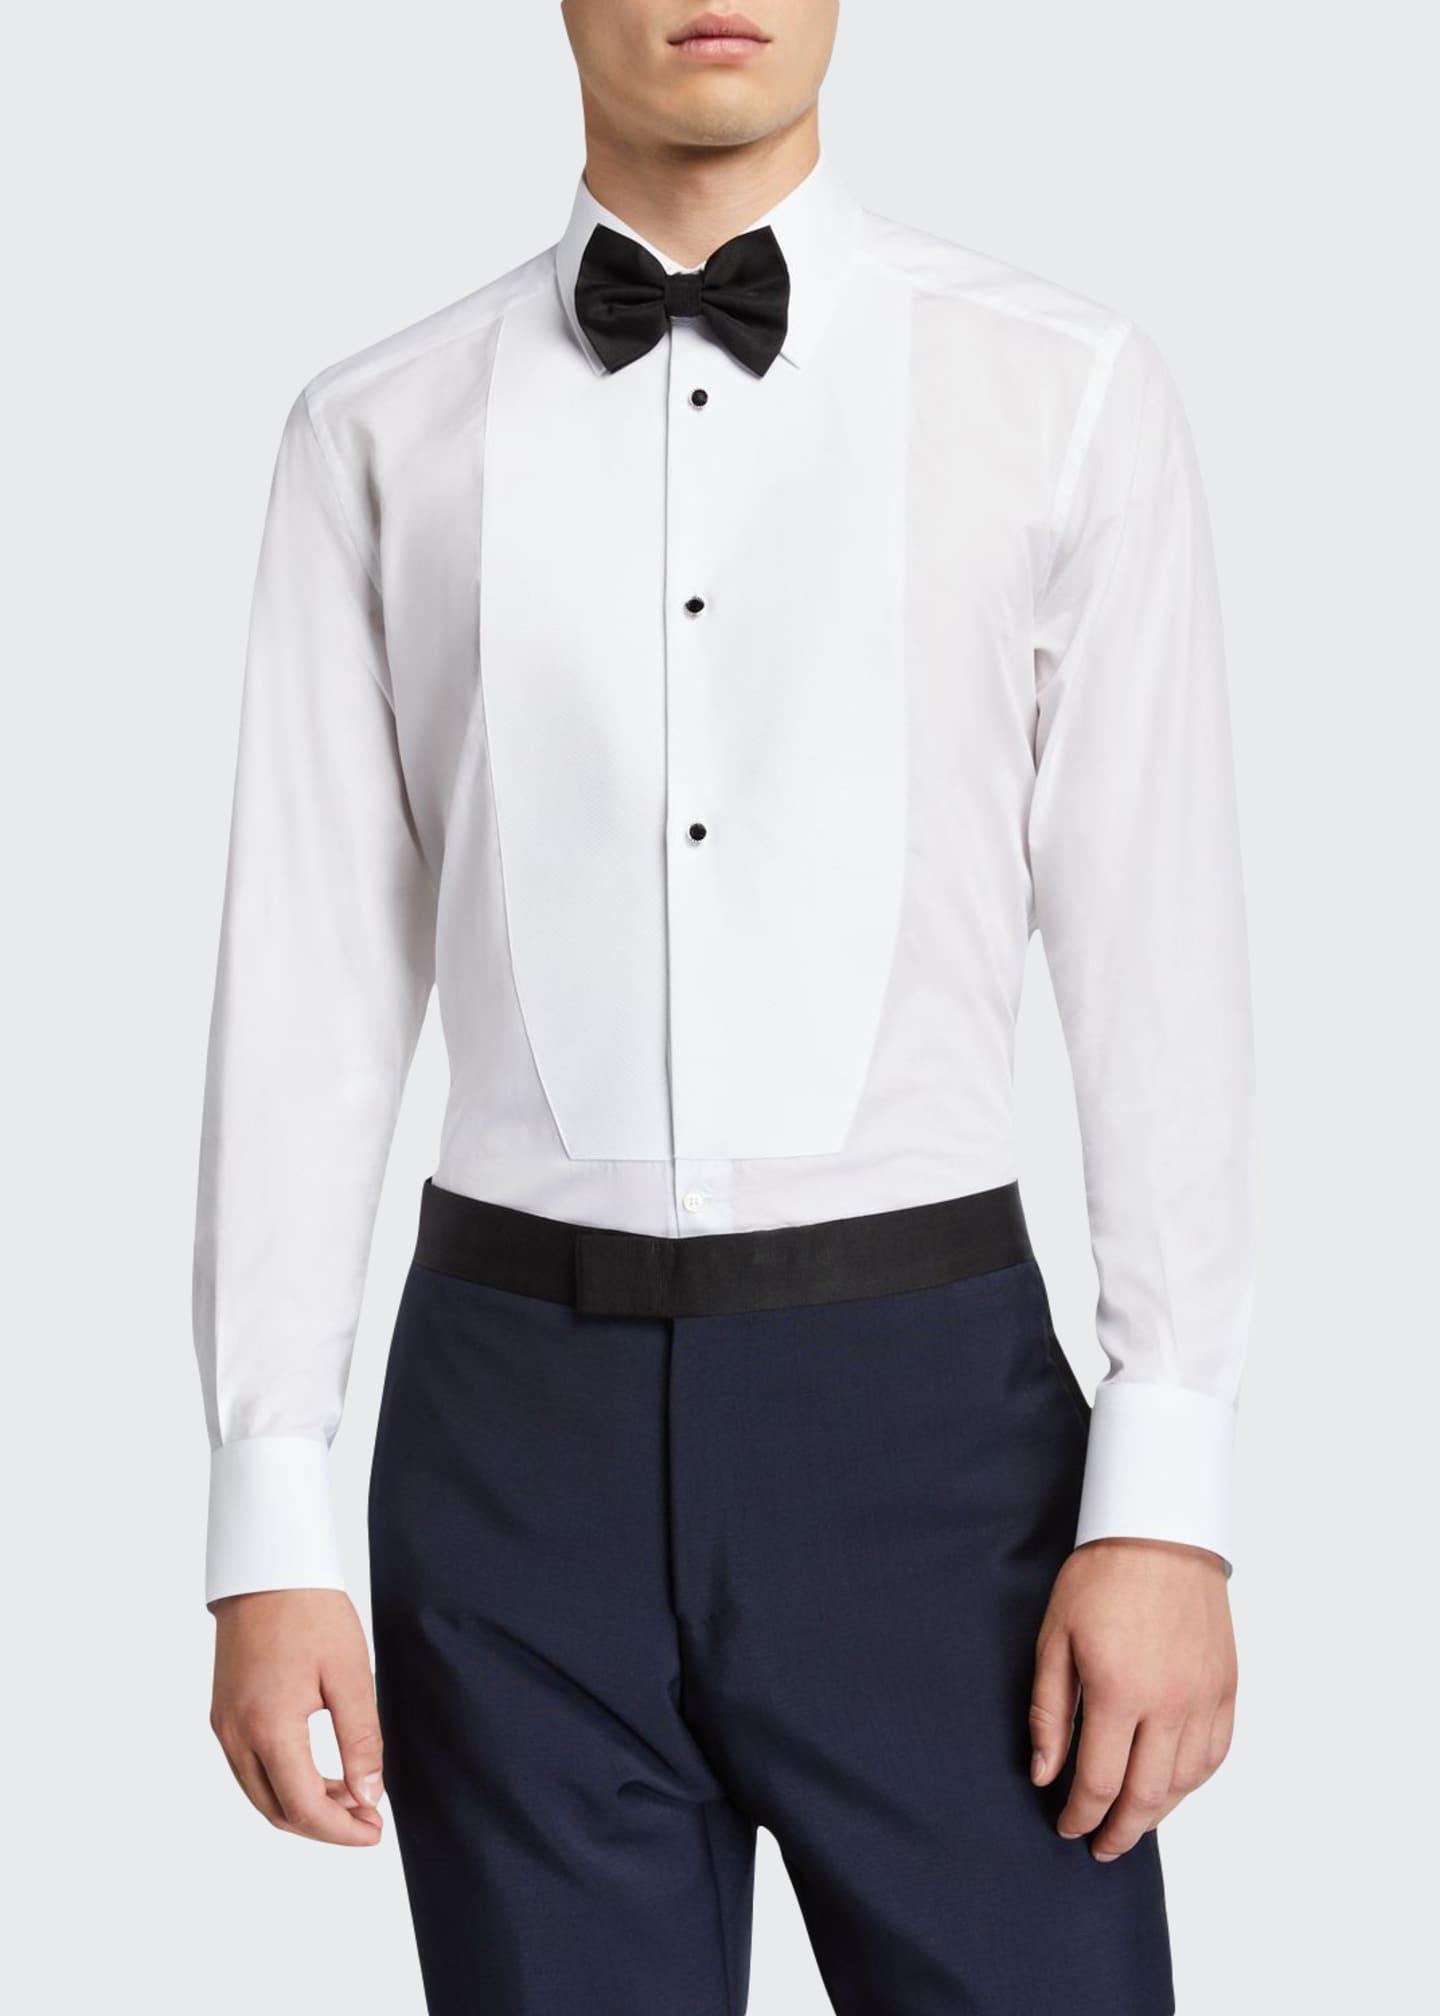 Dolce & Gabbana Men's Formal Bib-Front Tuxedo Shirt